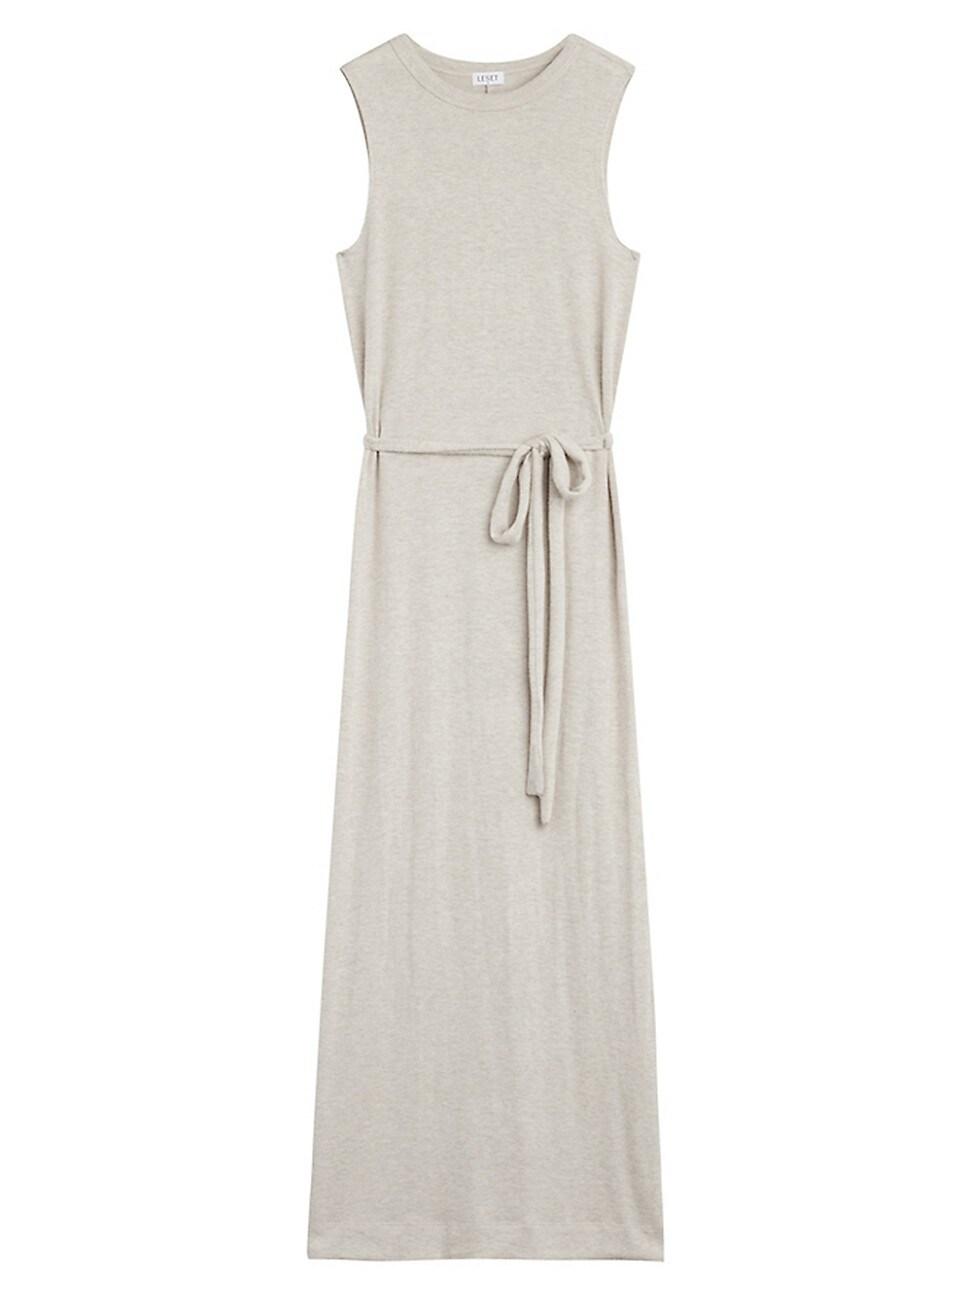 Leset WOMEN'S LORI DRAWSTRING DRESS